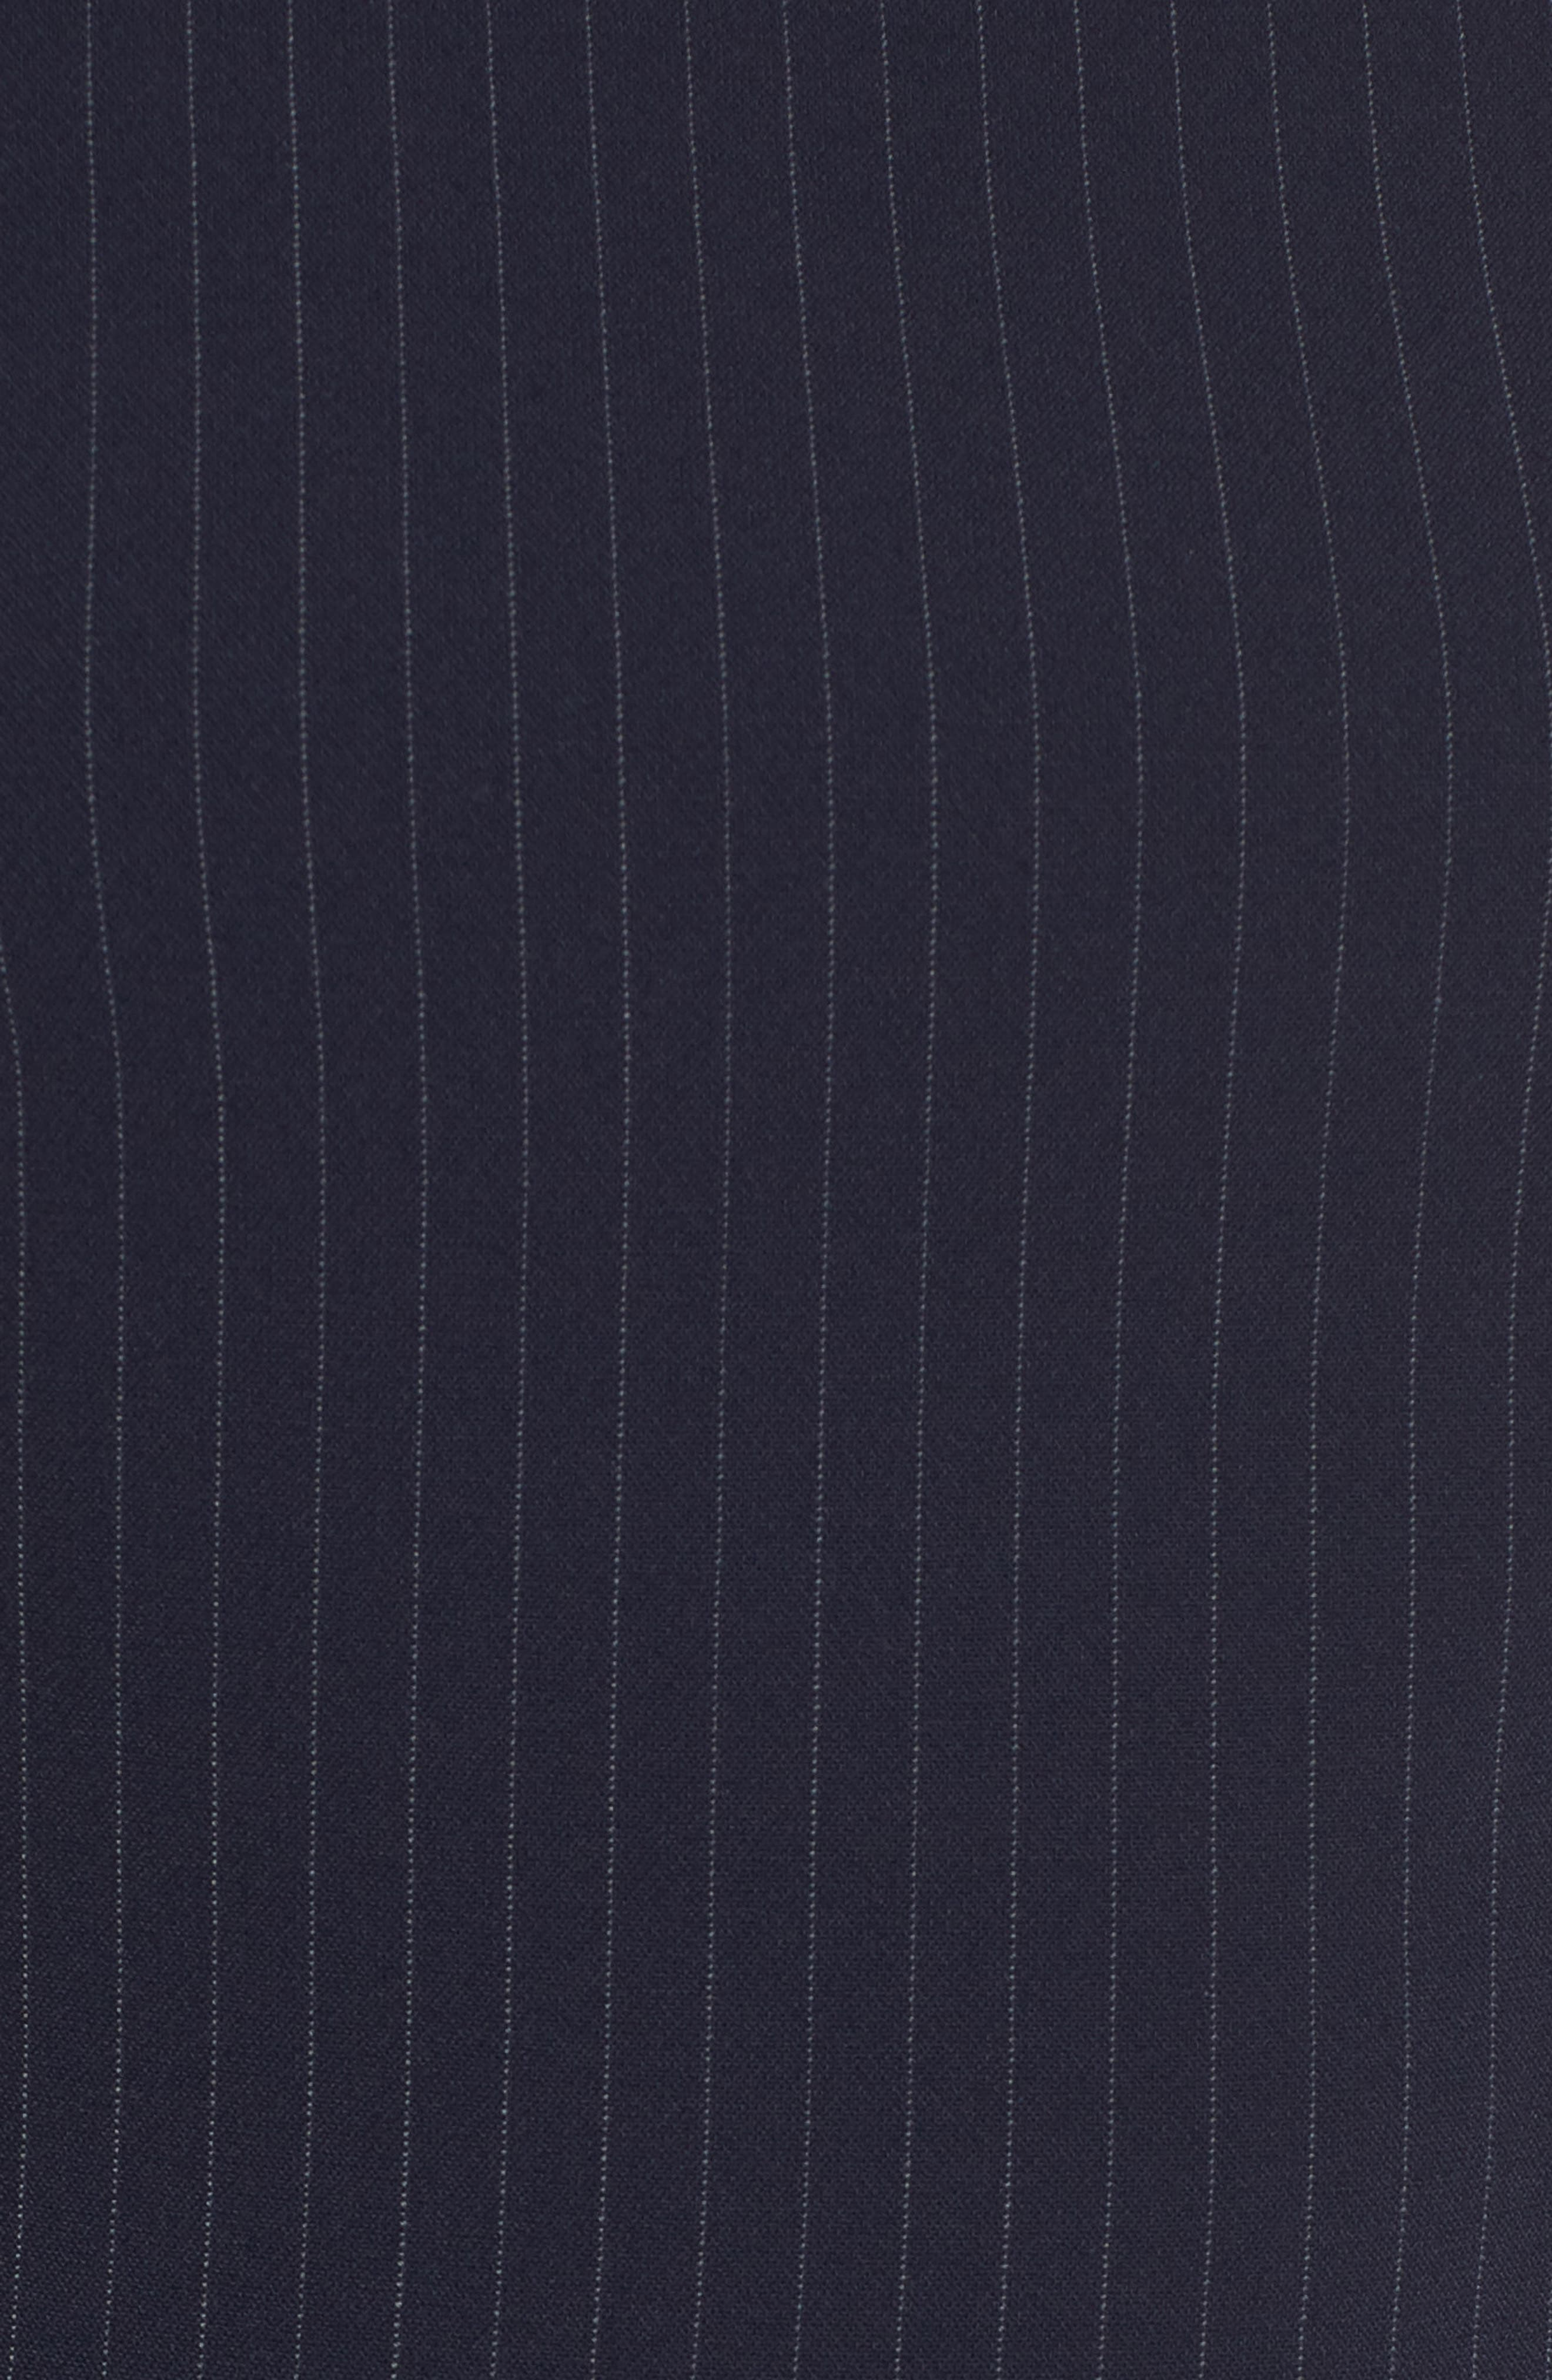 Denaka Pinstripe Sheath Dress,                             Alternate thumbnail 5, color,                             Nautical Fantasy